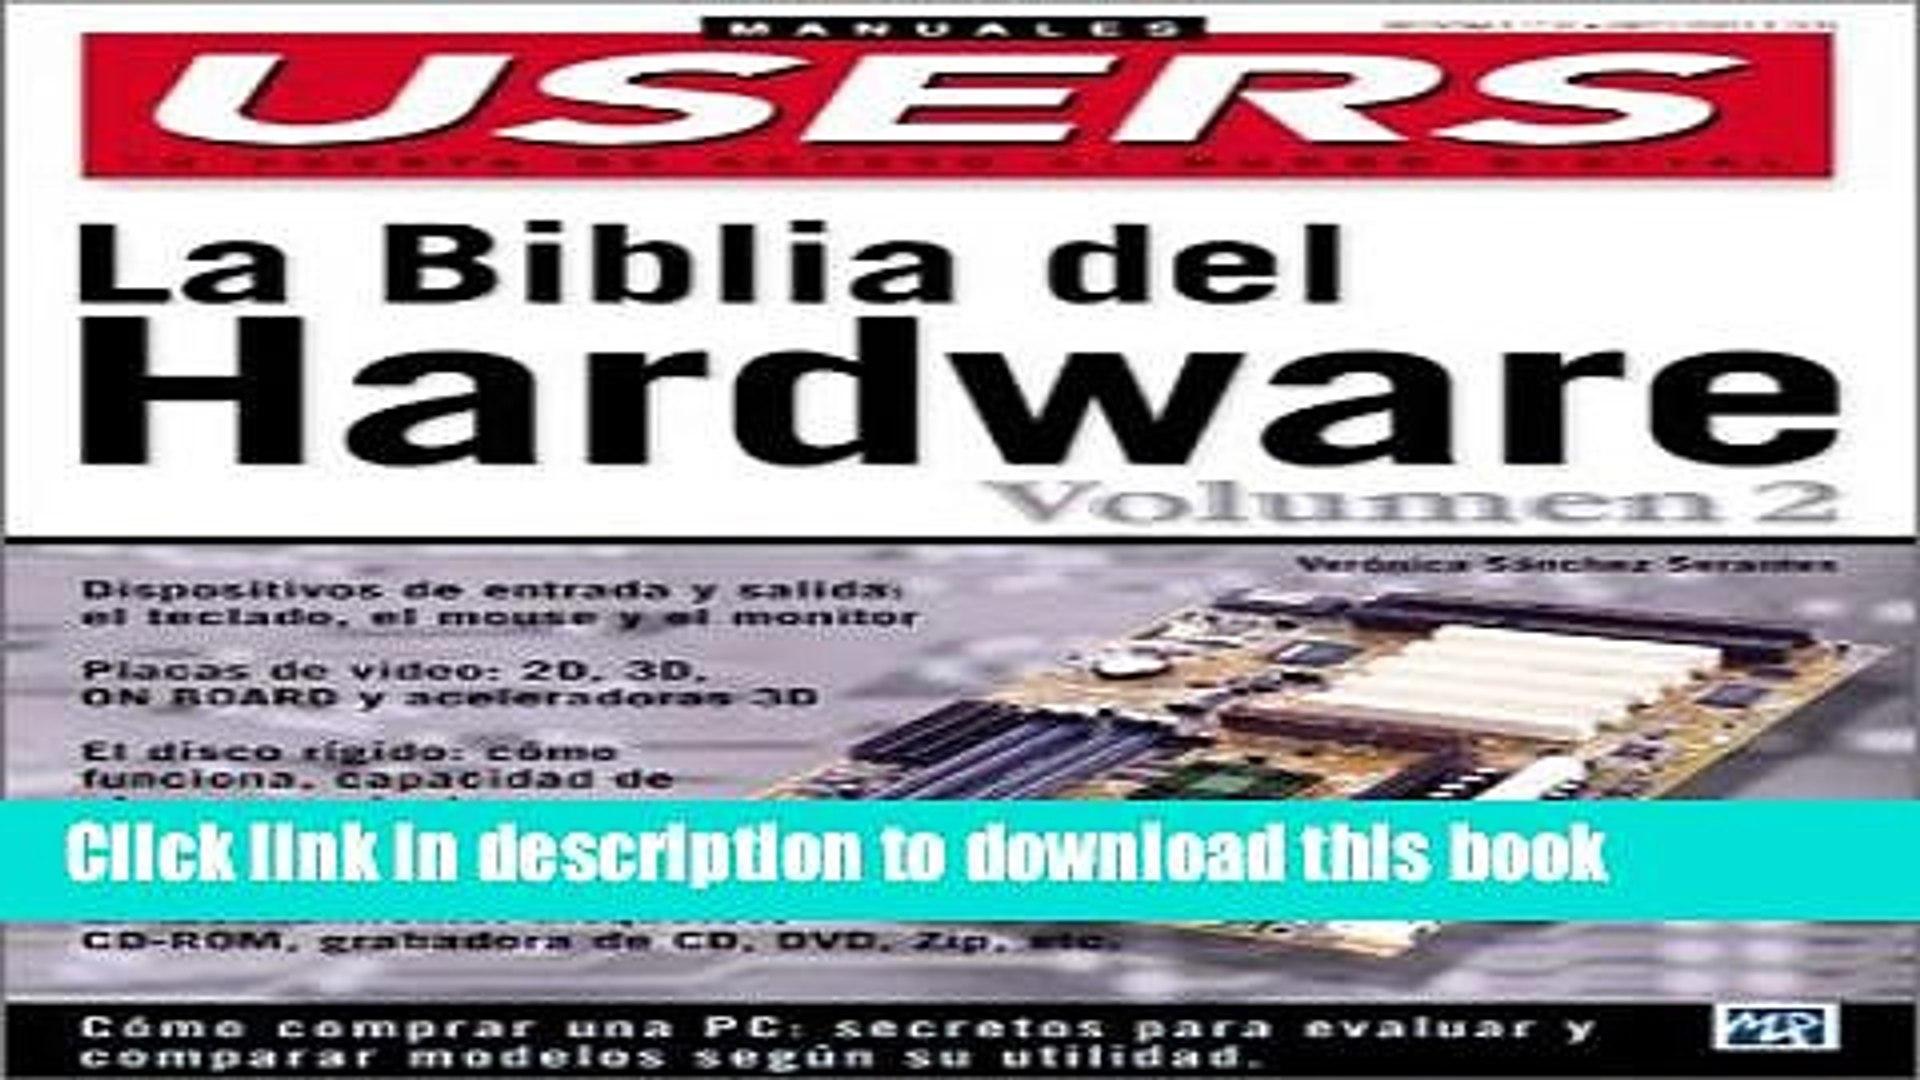 Read La Biblia del Hardware Volumen II: Manuales Users, en Espanol / Spanish (Hardware Bible)